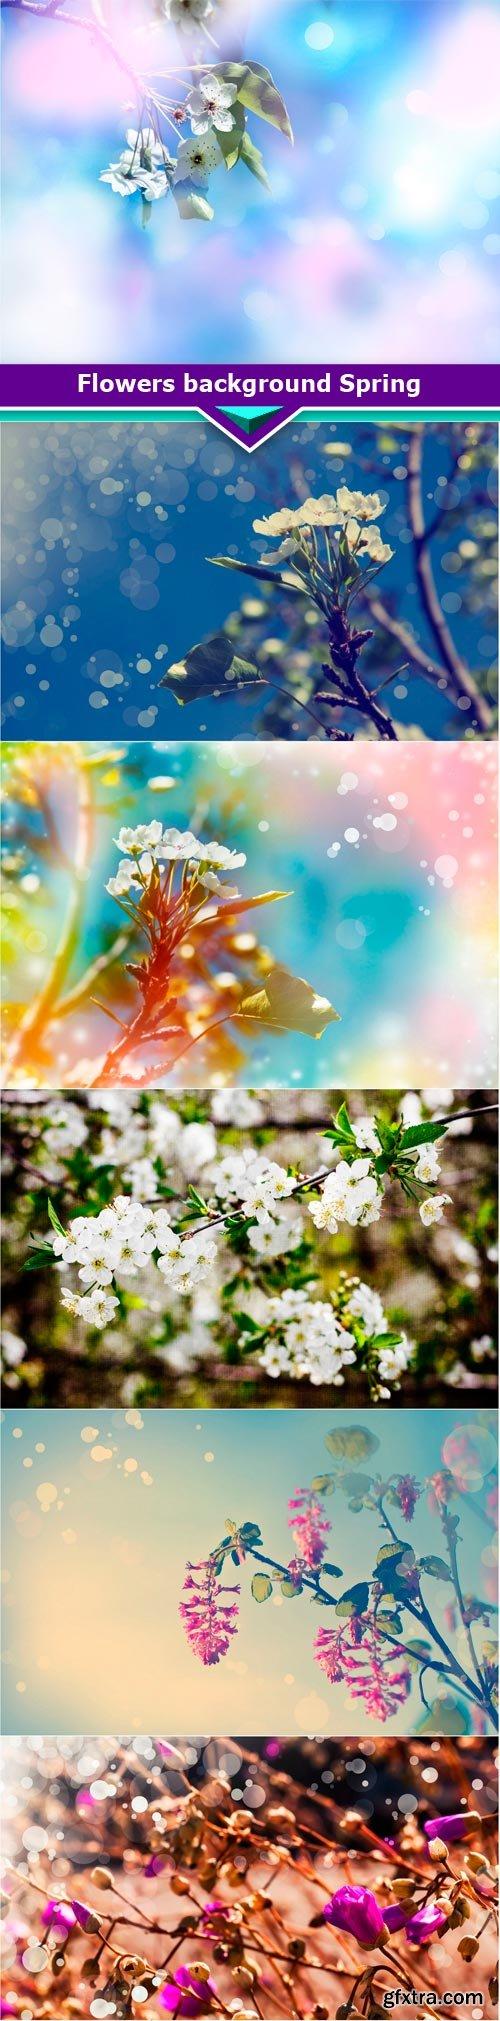 Flowers background Spring 6x JPEG